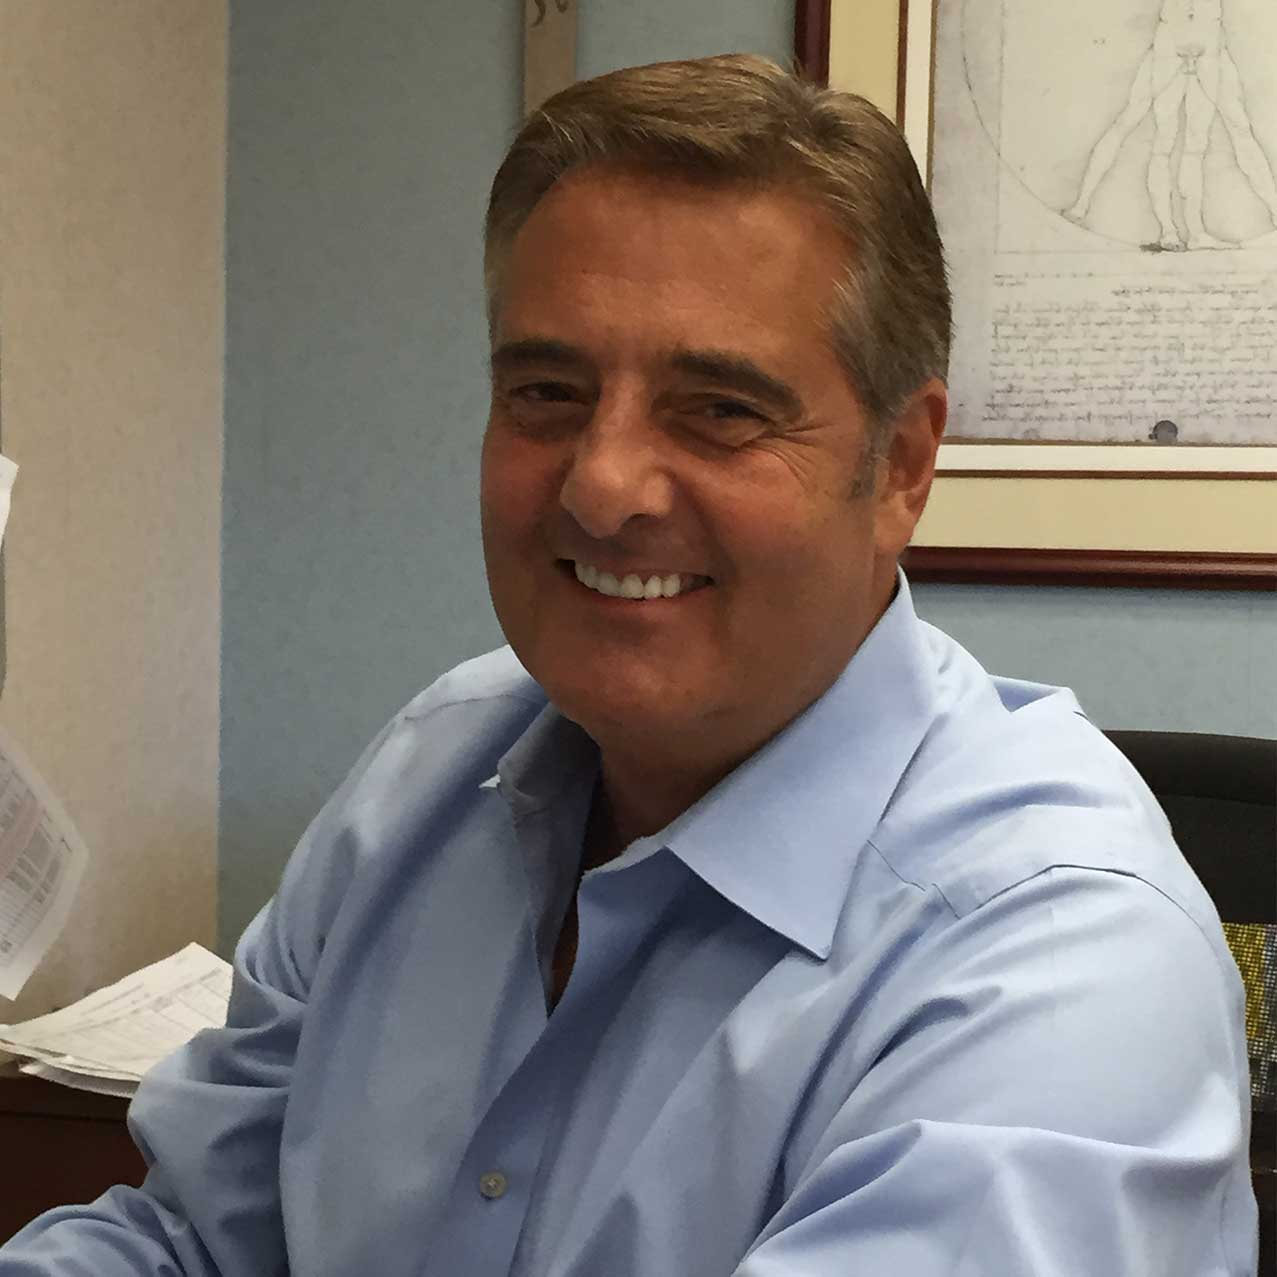 John Beyer, Board Member